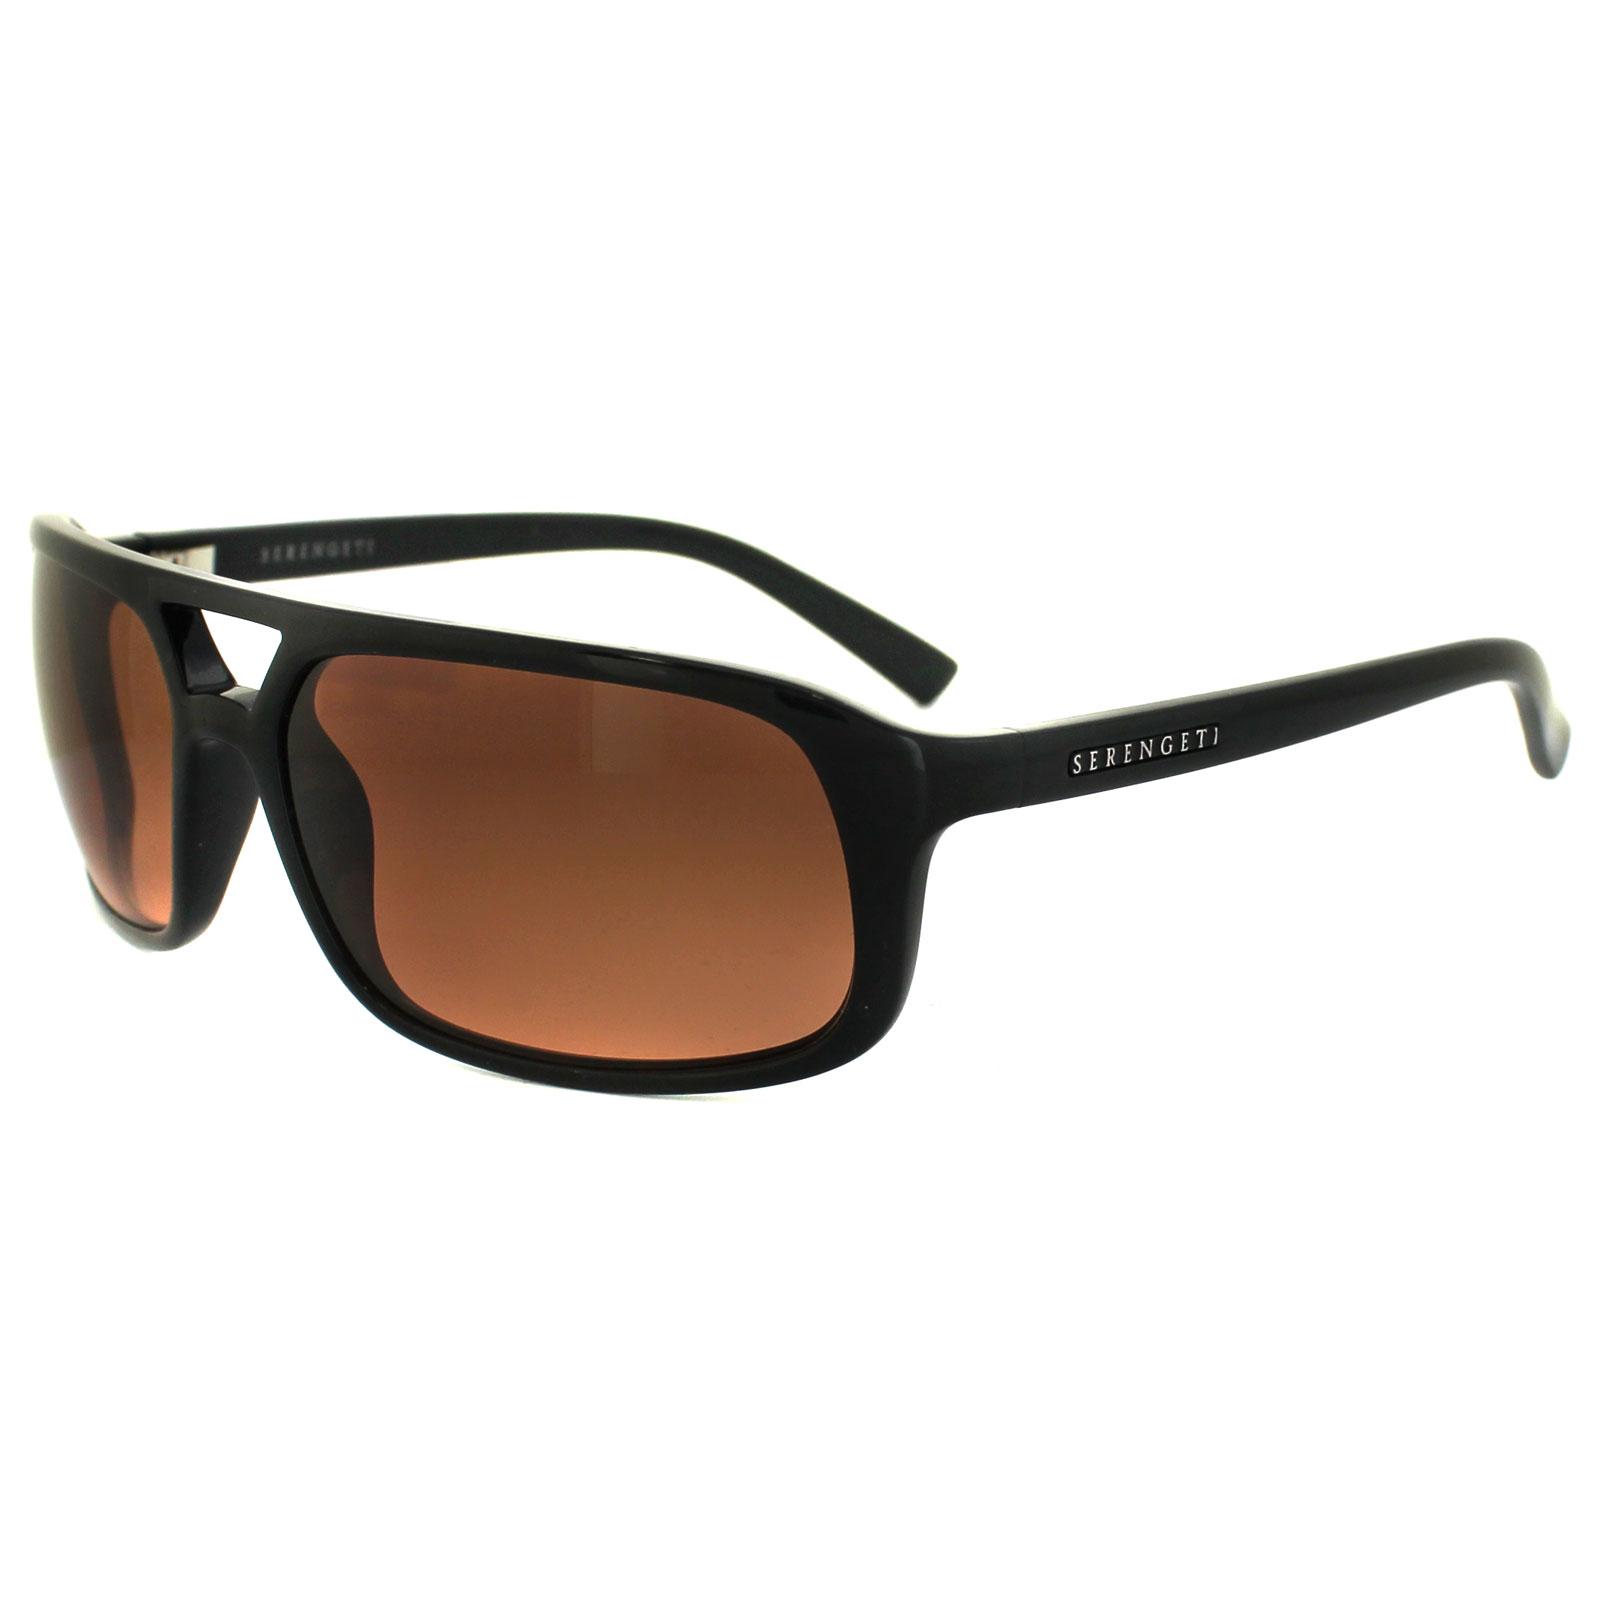 5f7bad452385 Serengeti Large Aviator Sunglasses - Bitterroot Public Library